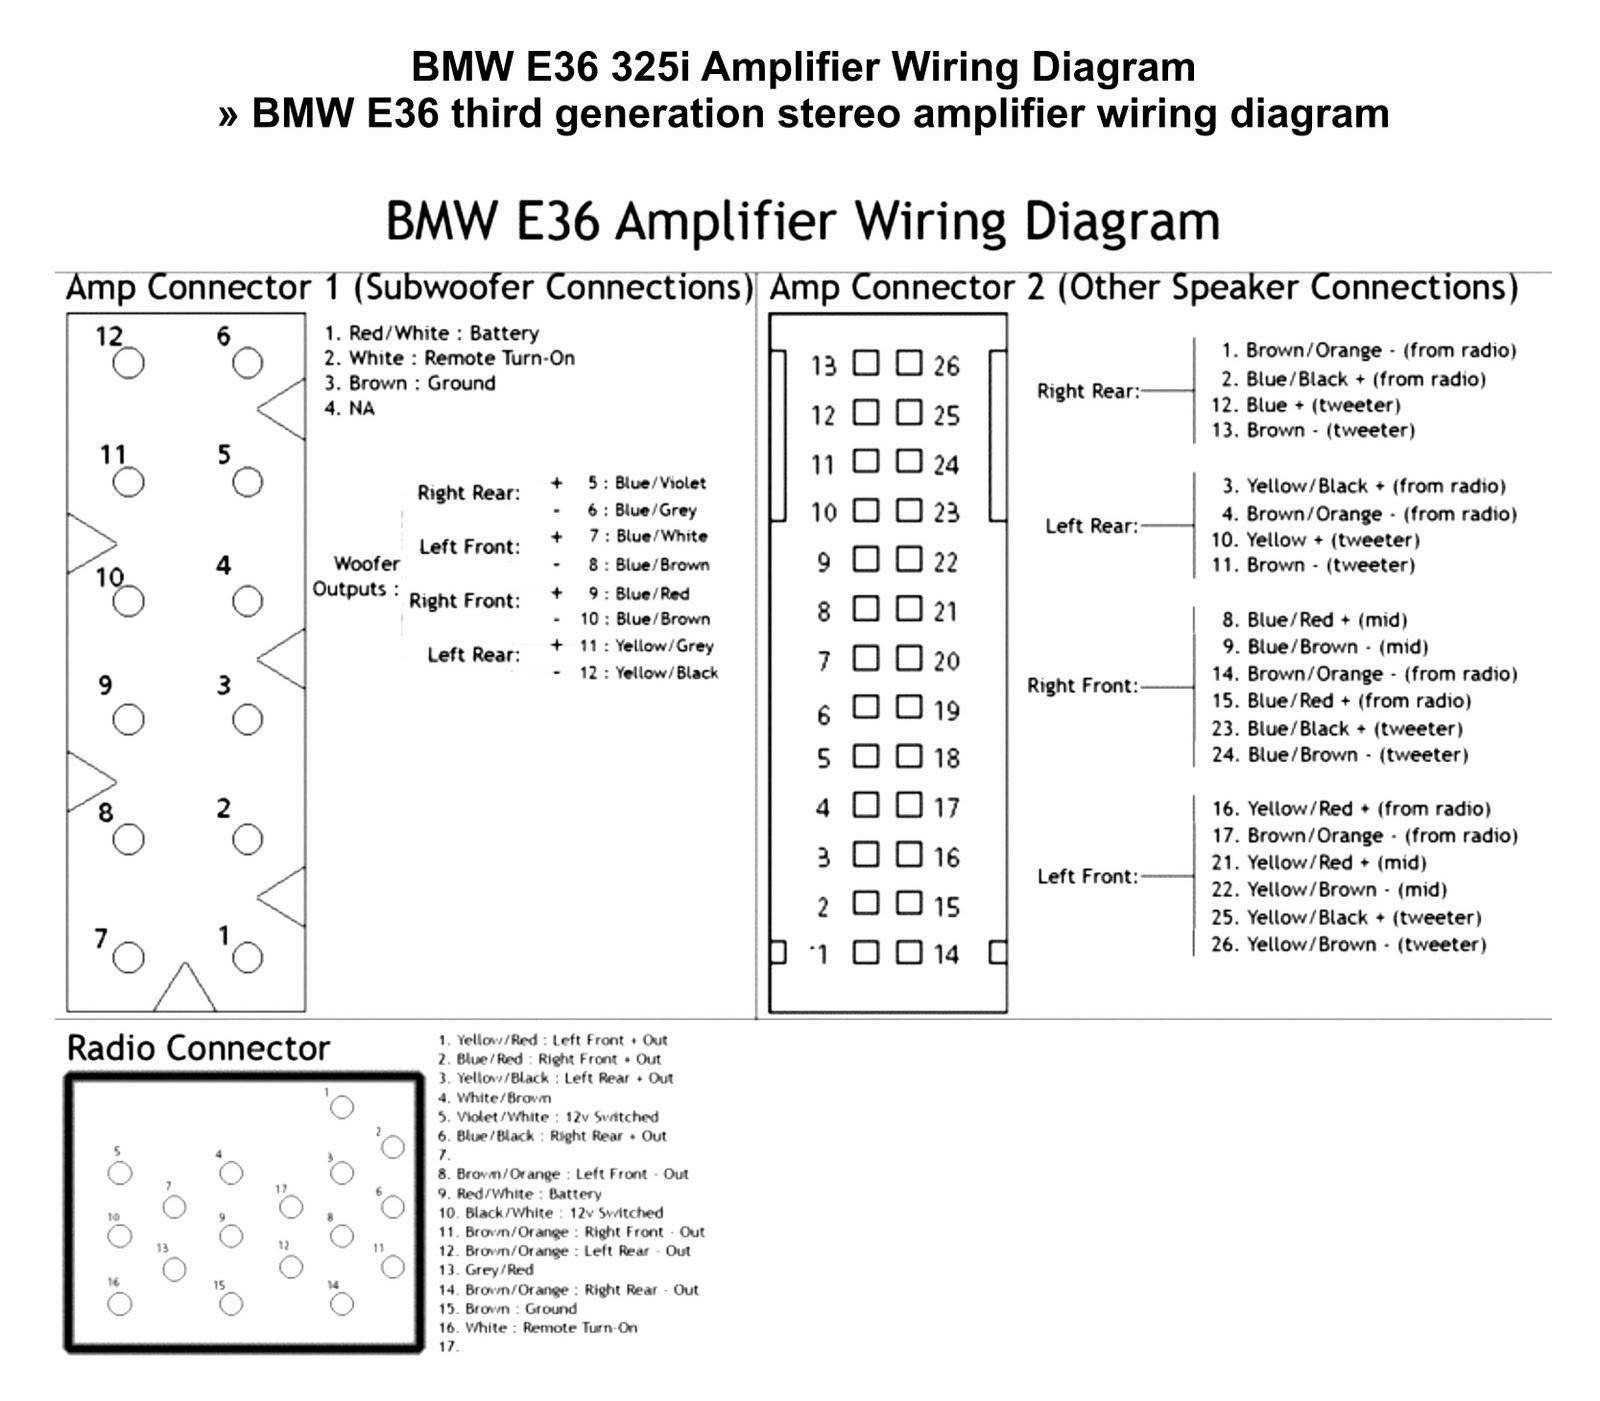 Bmw E36 Wiring Diagram Online - Wiring Diagram and Schematic